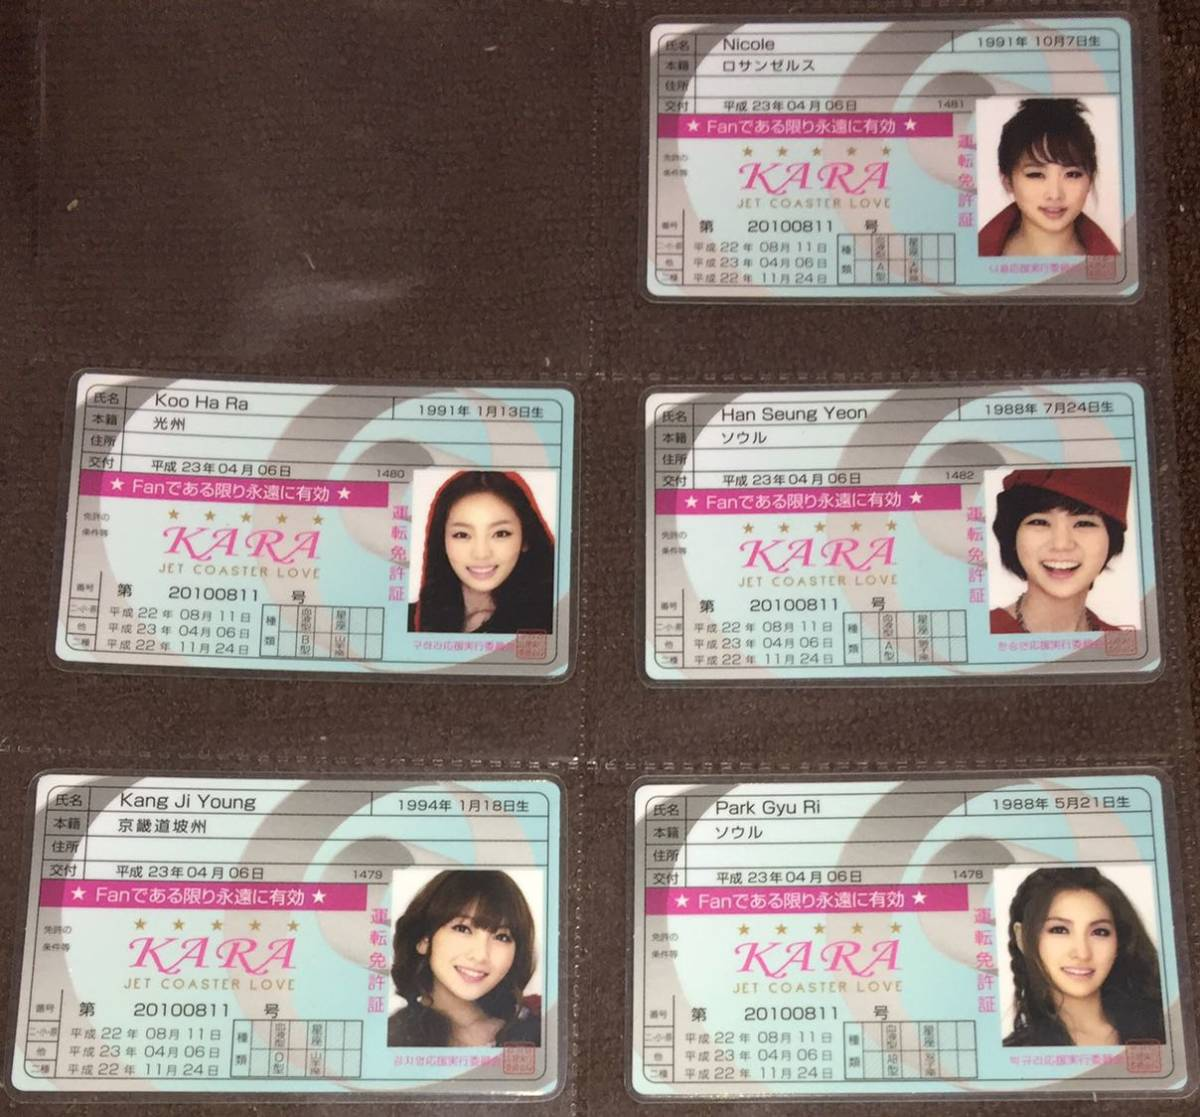 ★★KARA/カラ★【KARA/メンバー免許証#1】 (ギュリ,スンヨン,ハラ,ニコル,ジヨン)